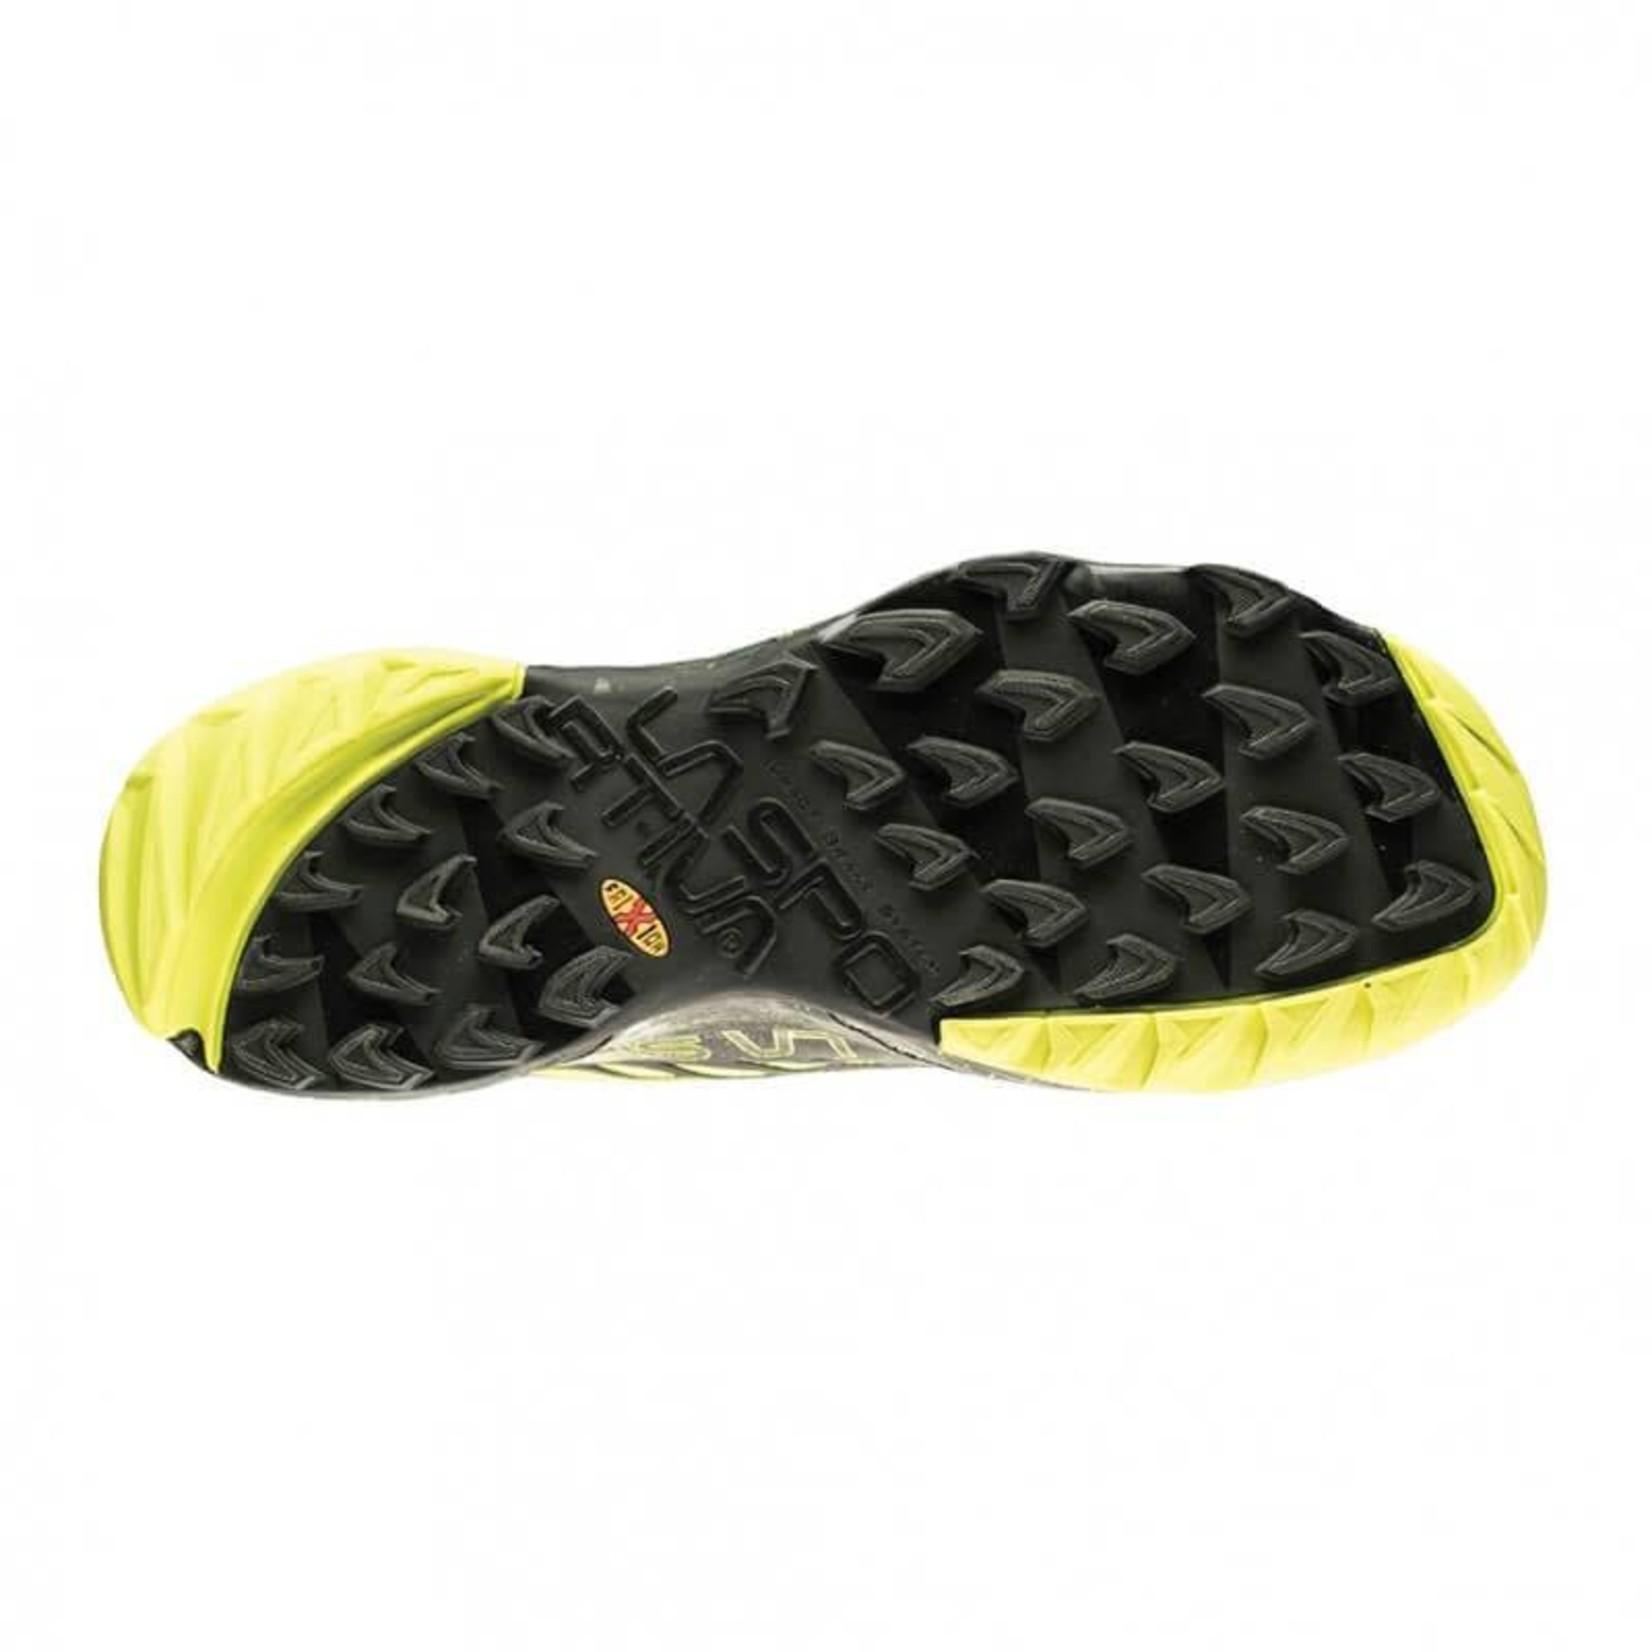 La Sportiva La Sportiva Akasha Running Shoes - Men